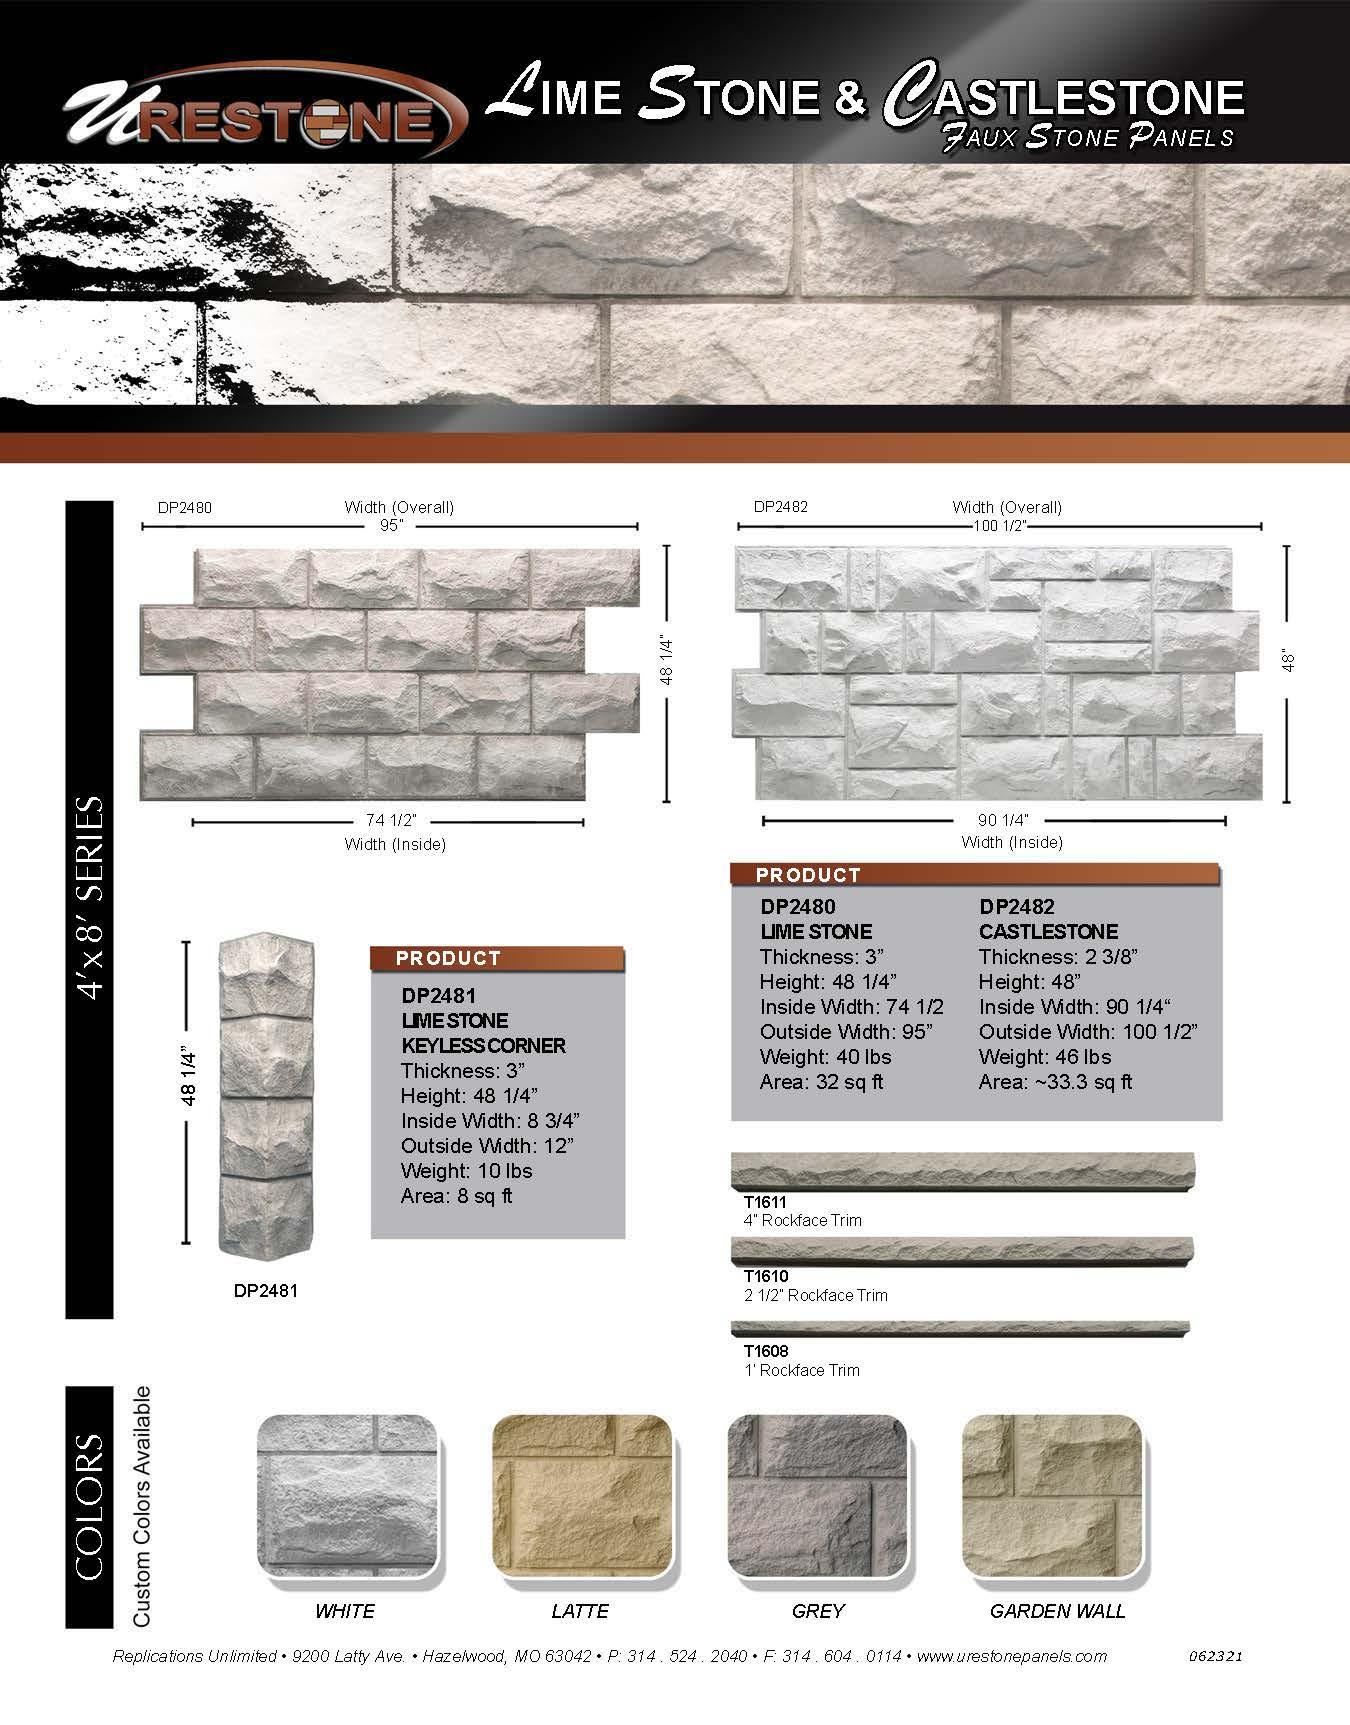 Limestone - Castlestone Data Sheet